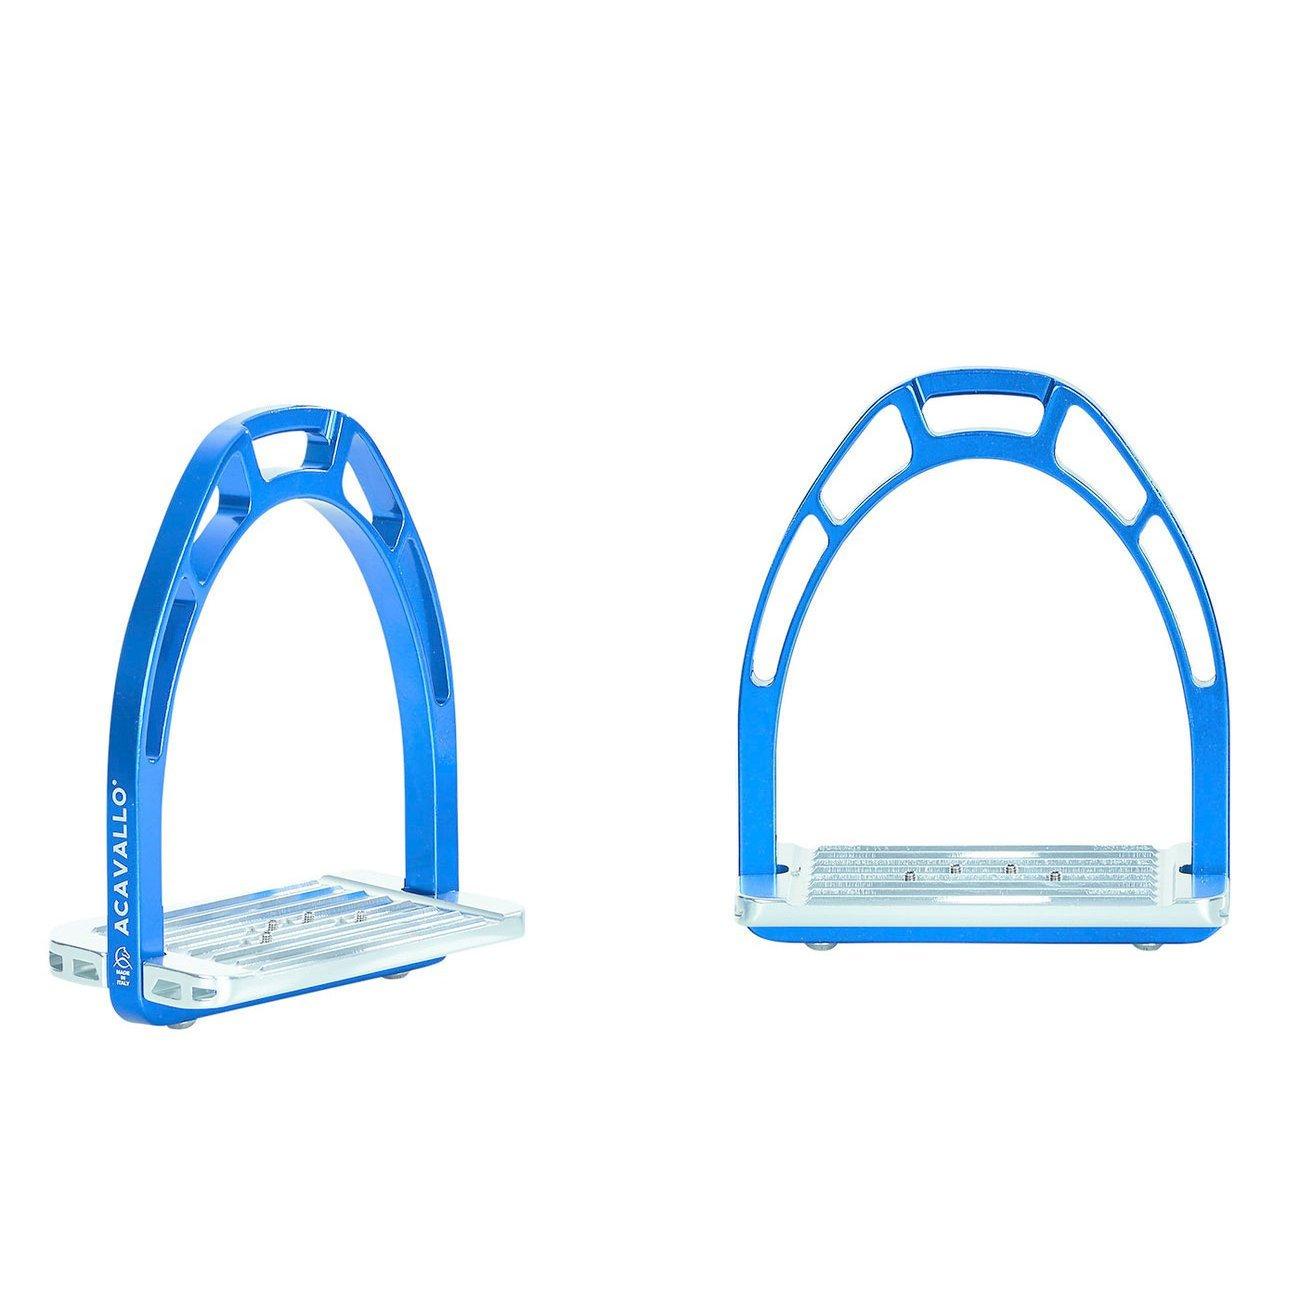 BUSSE Acavallo Steigbügel Arco Alupro, blau